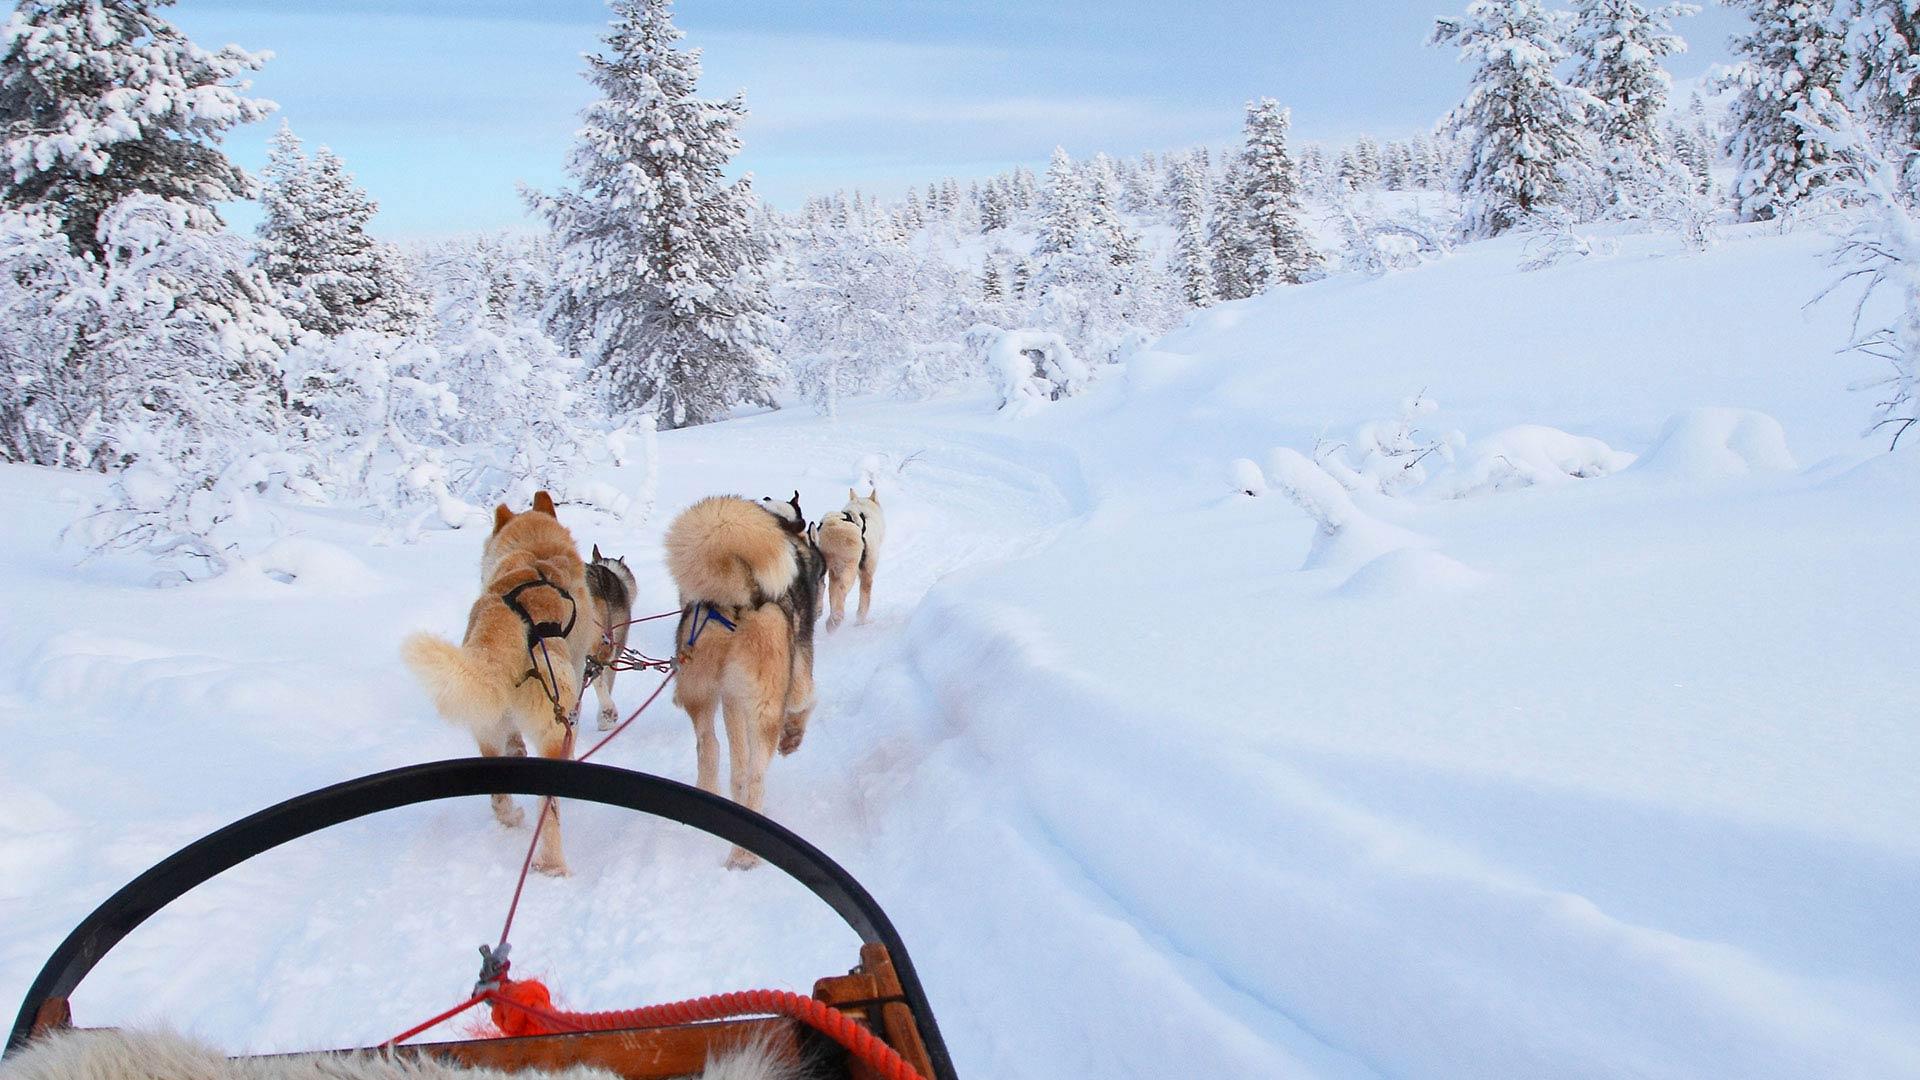 lapland a finnish lapland rejseguide.